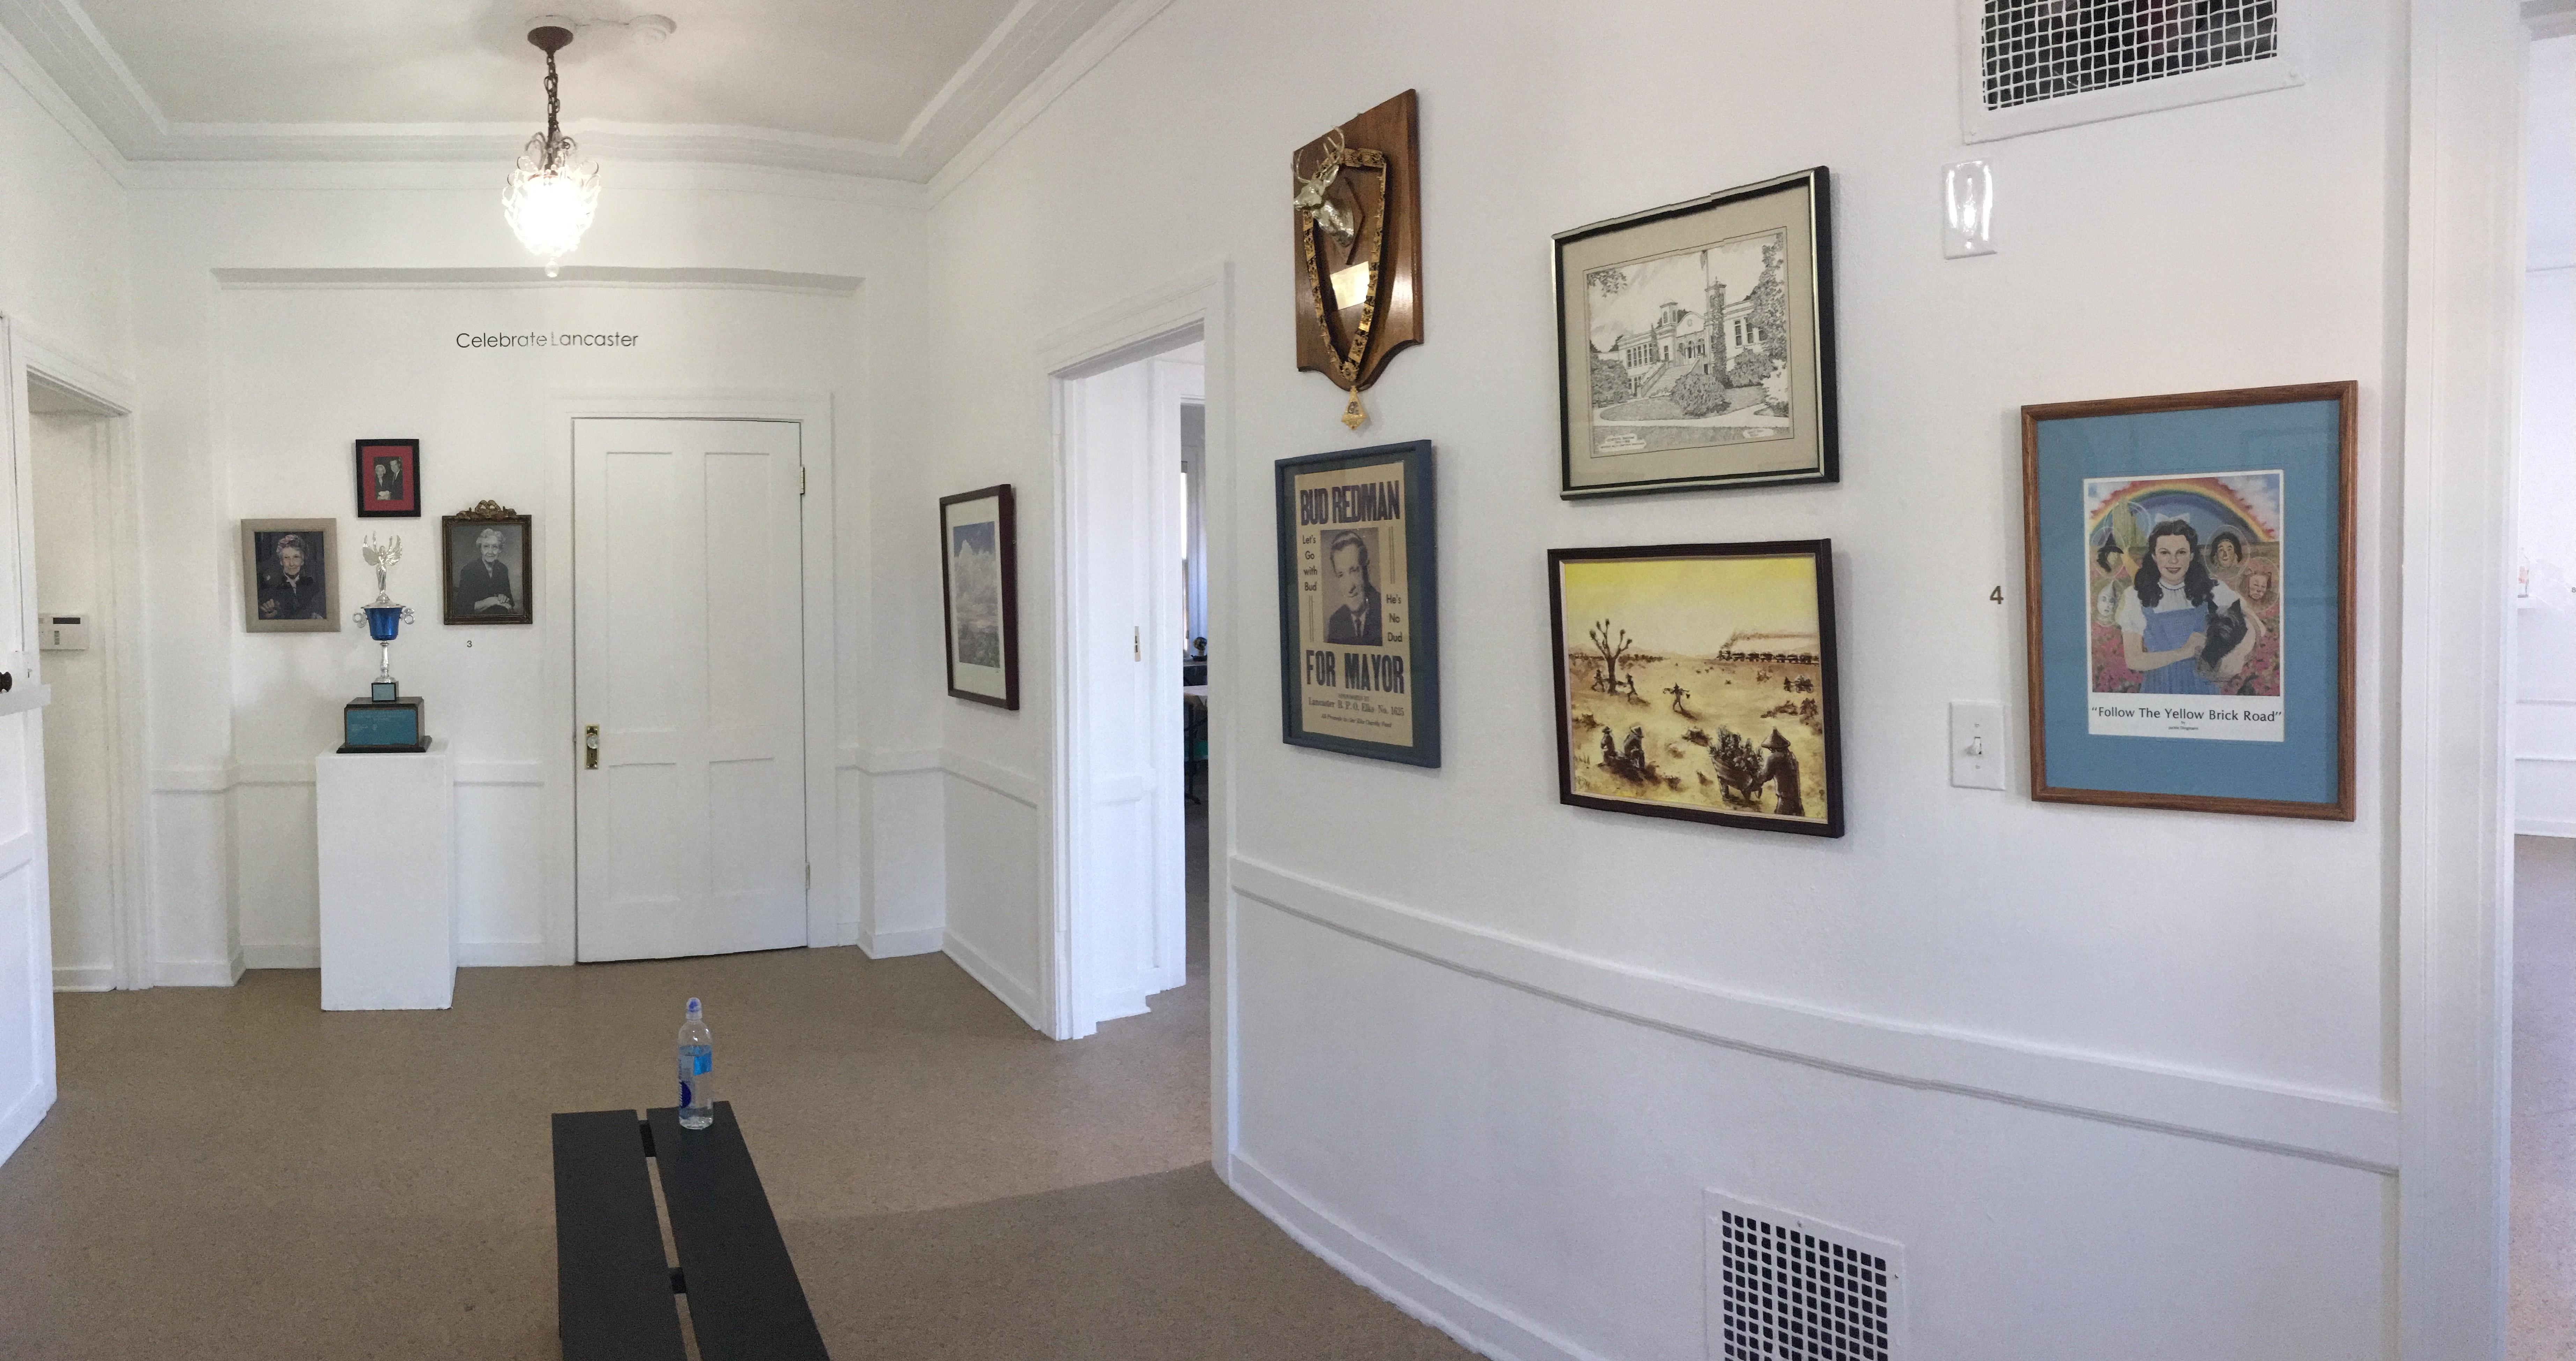 Celebrate Lancaster Exhibit Image 2